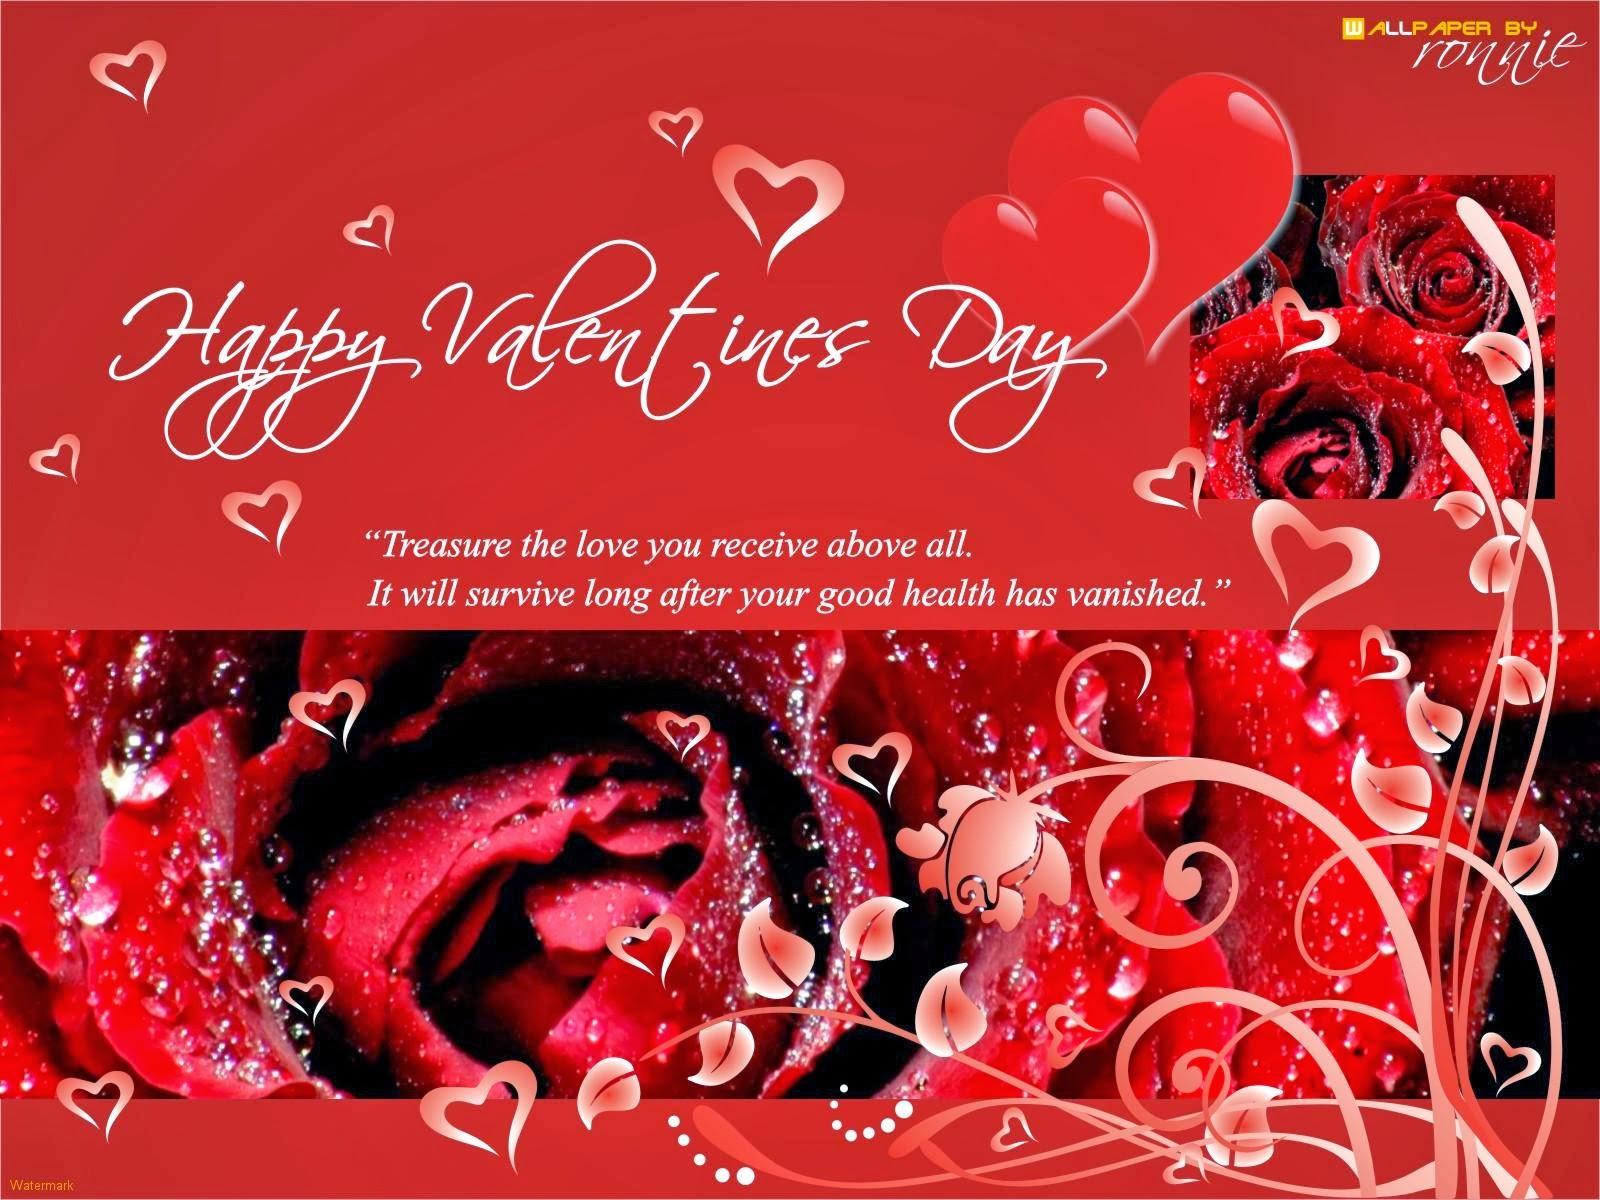 http://detatuaje.blogspot.ca/2012/02/valentines-day-hearts.html